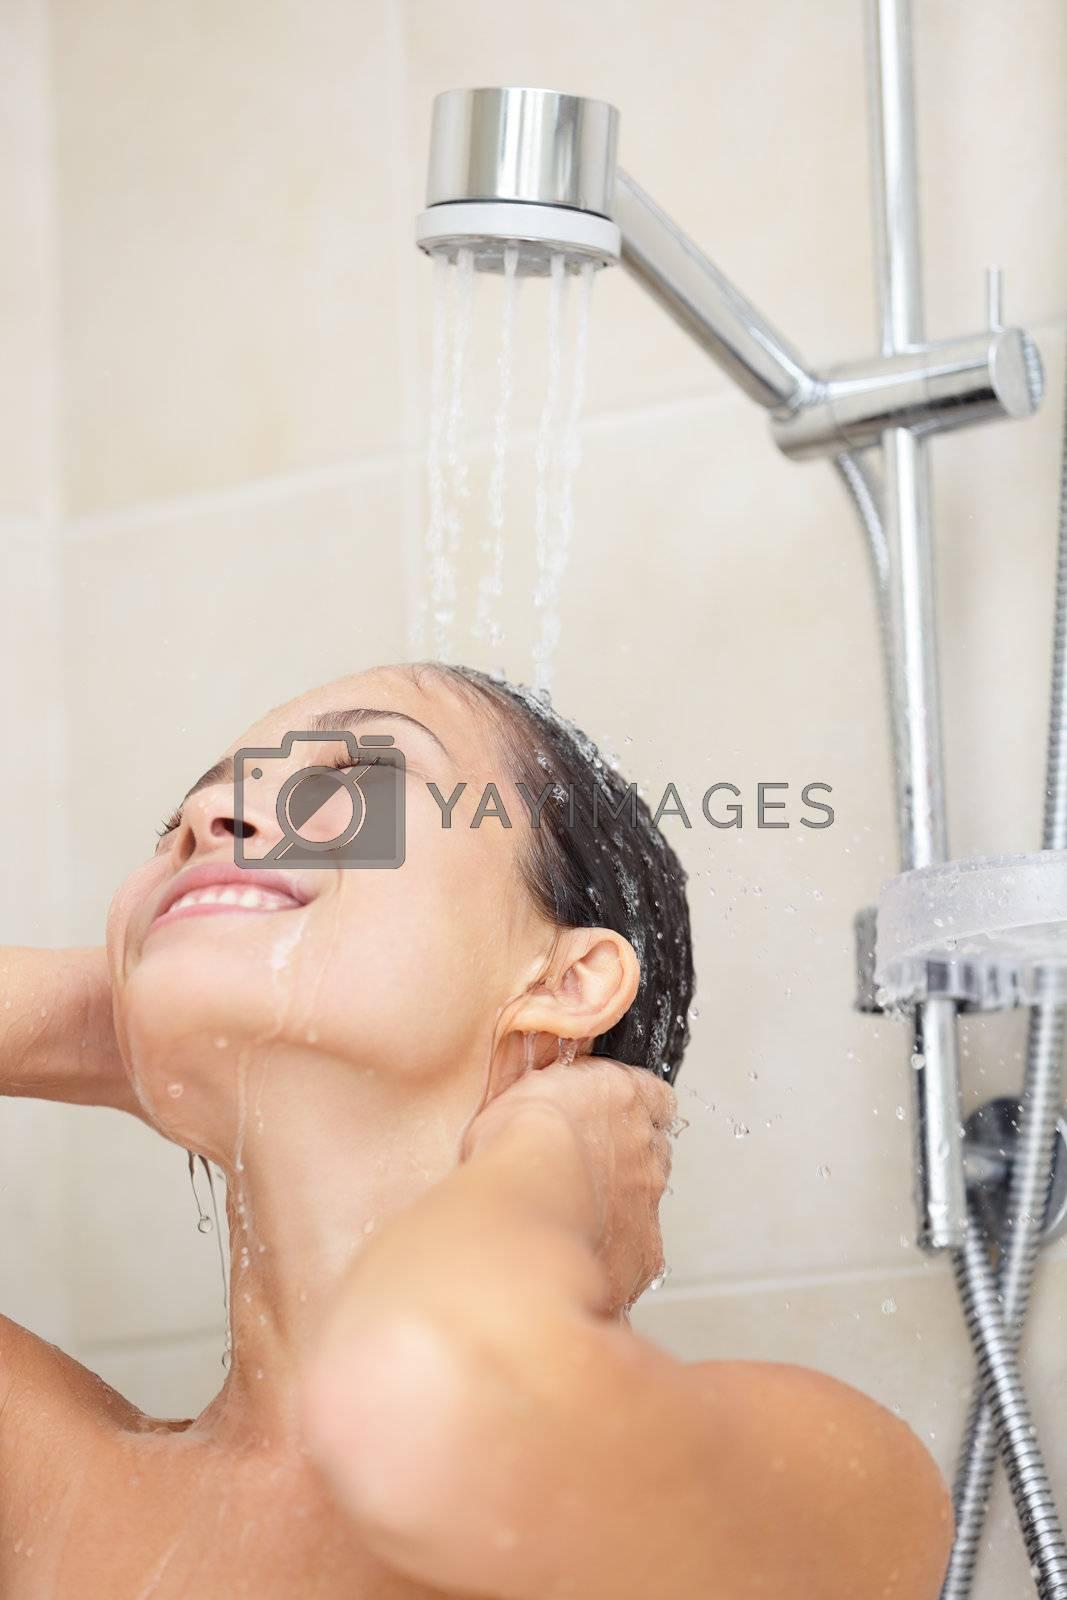 Shower woman showering under running water in bathroom. Smiling happy portrait of Asian woman in her twenties.